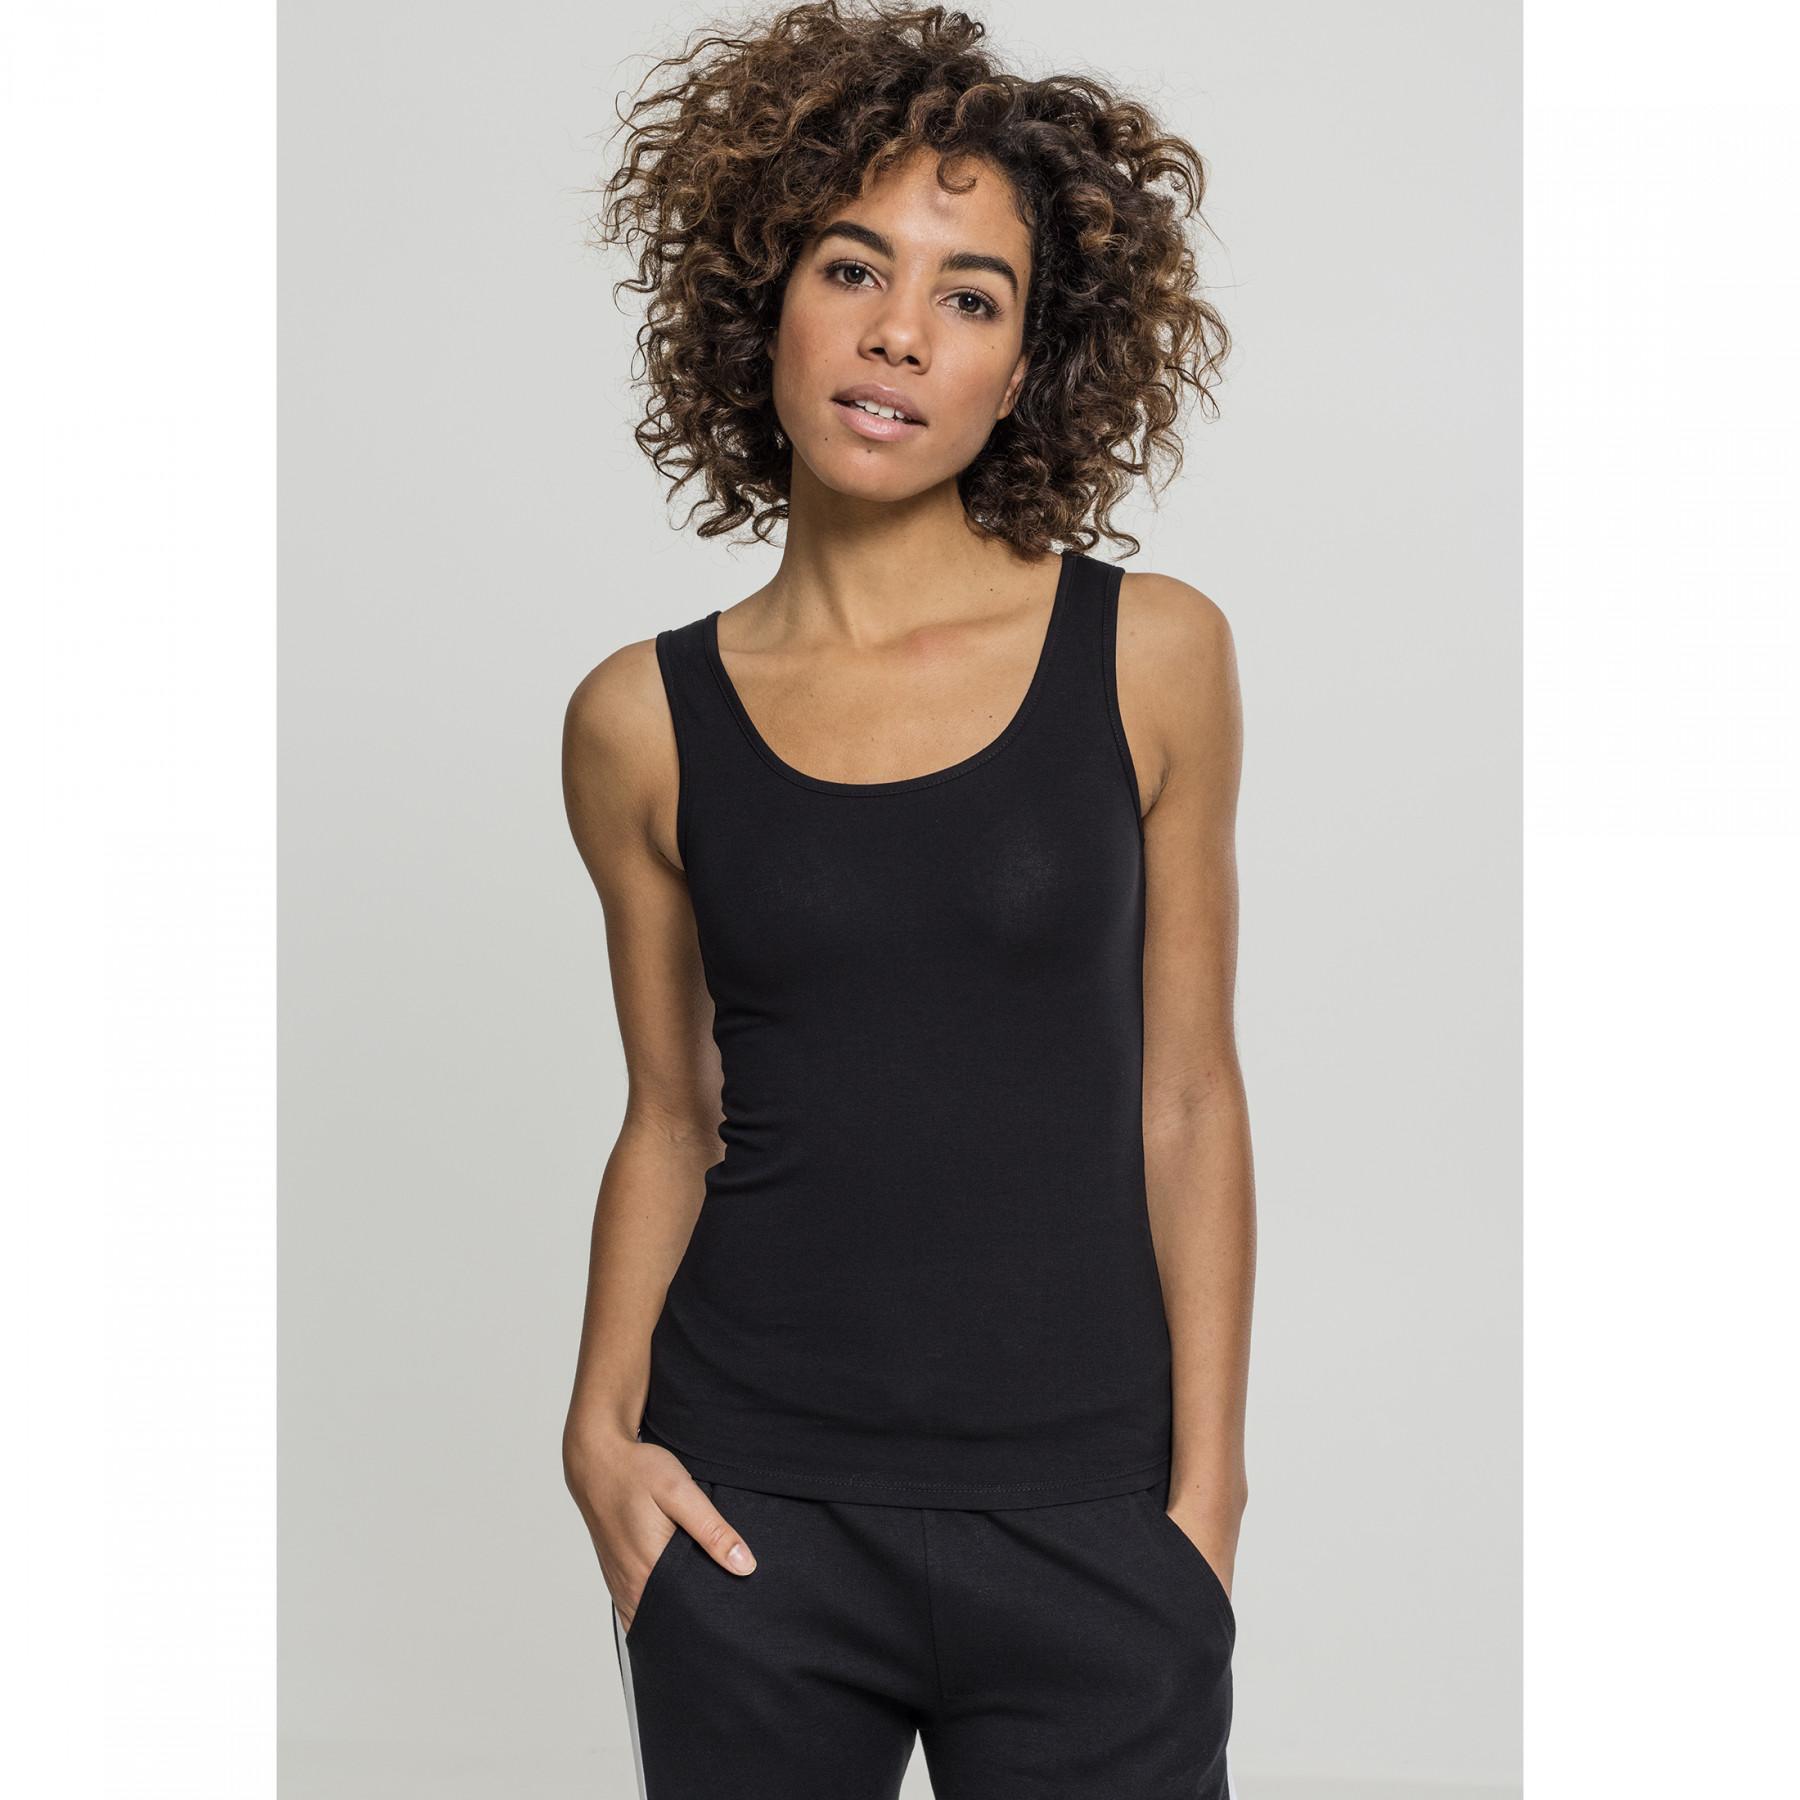 Pack of 2 Women's bras Urban Classic basic